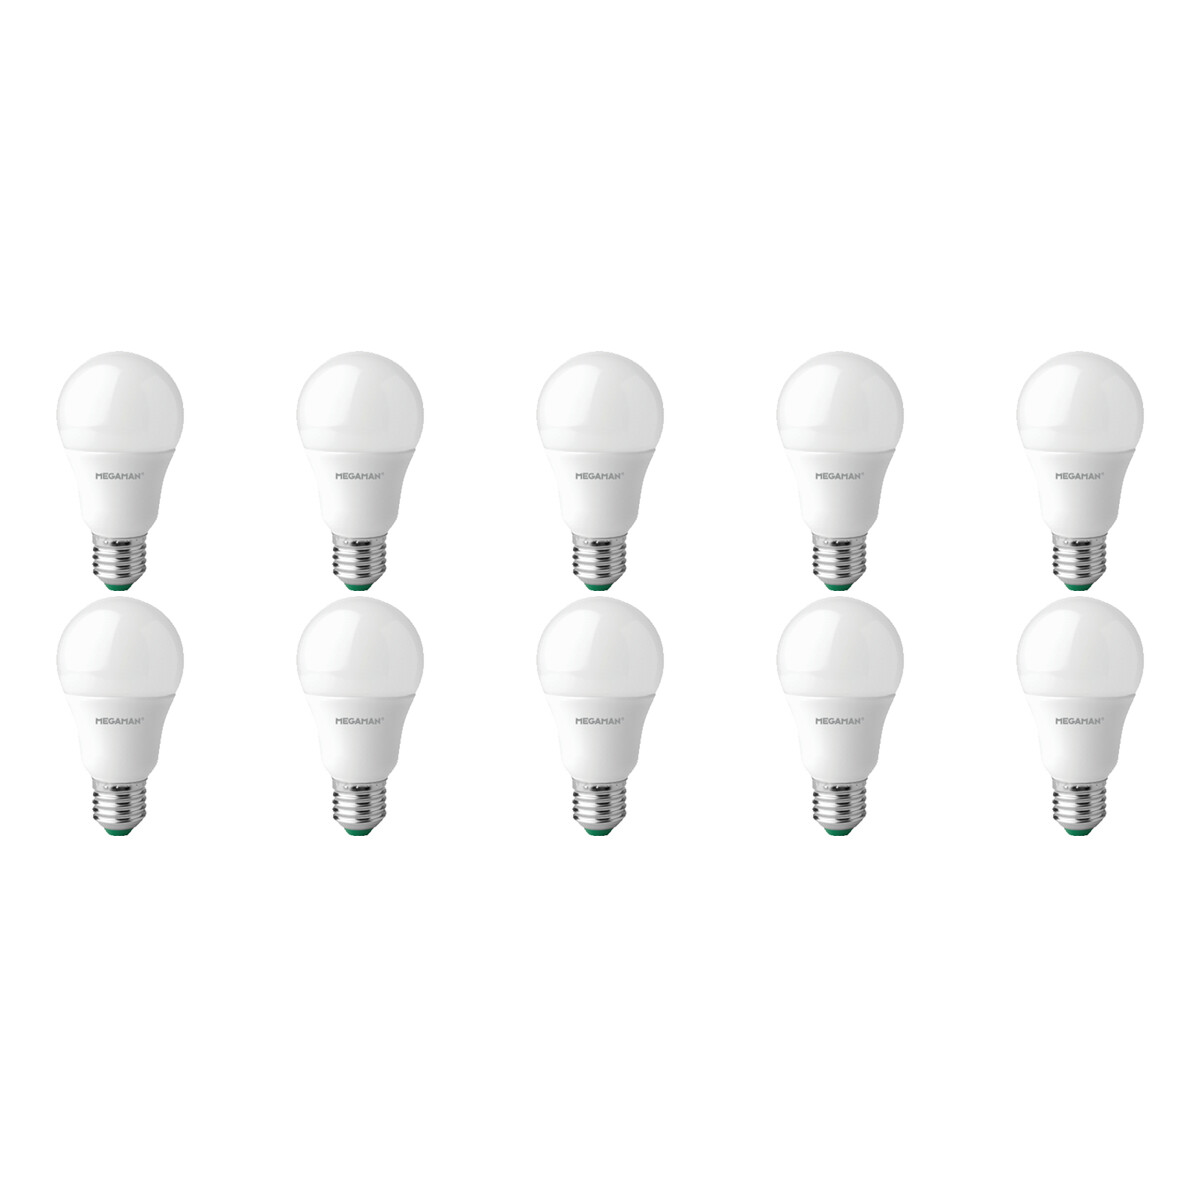 MEGAMAN - LED Lamp 10 Pack - Hatso - A60 - E27 Fitting - Dim to Warm Dimbaar - 6W - Warm Wit 3300K -